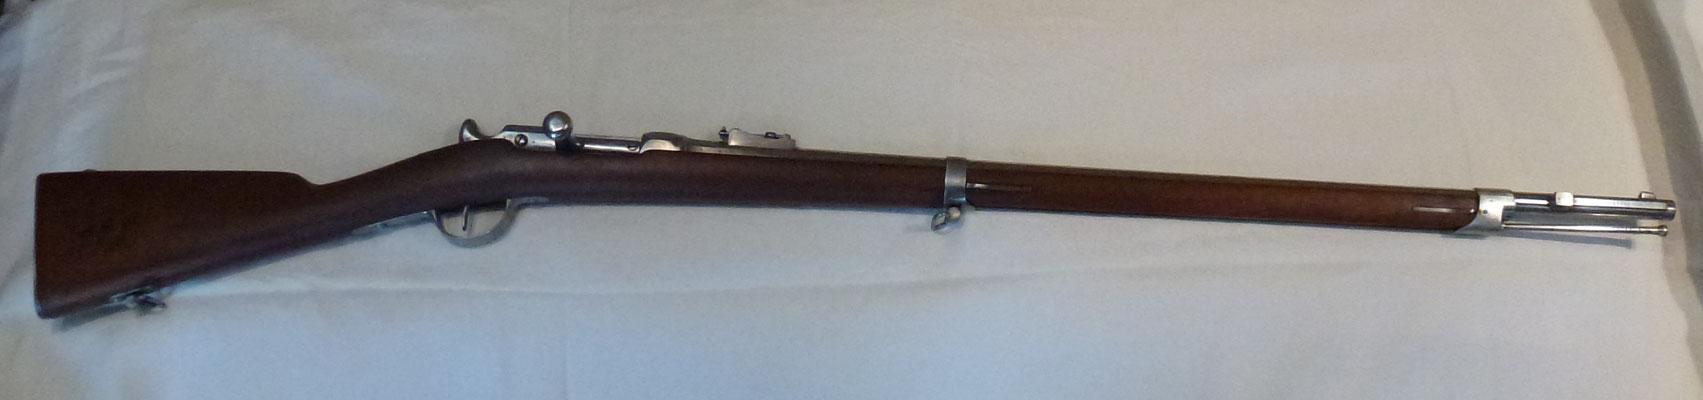 fusil chassepot mle 1866